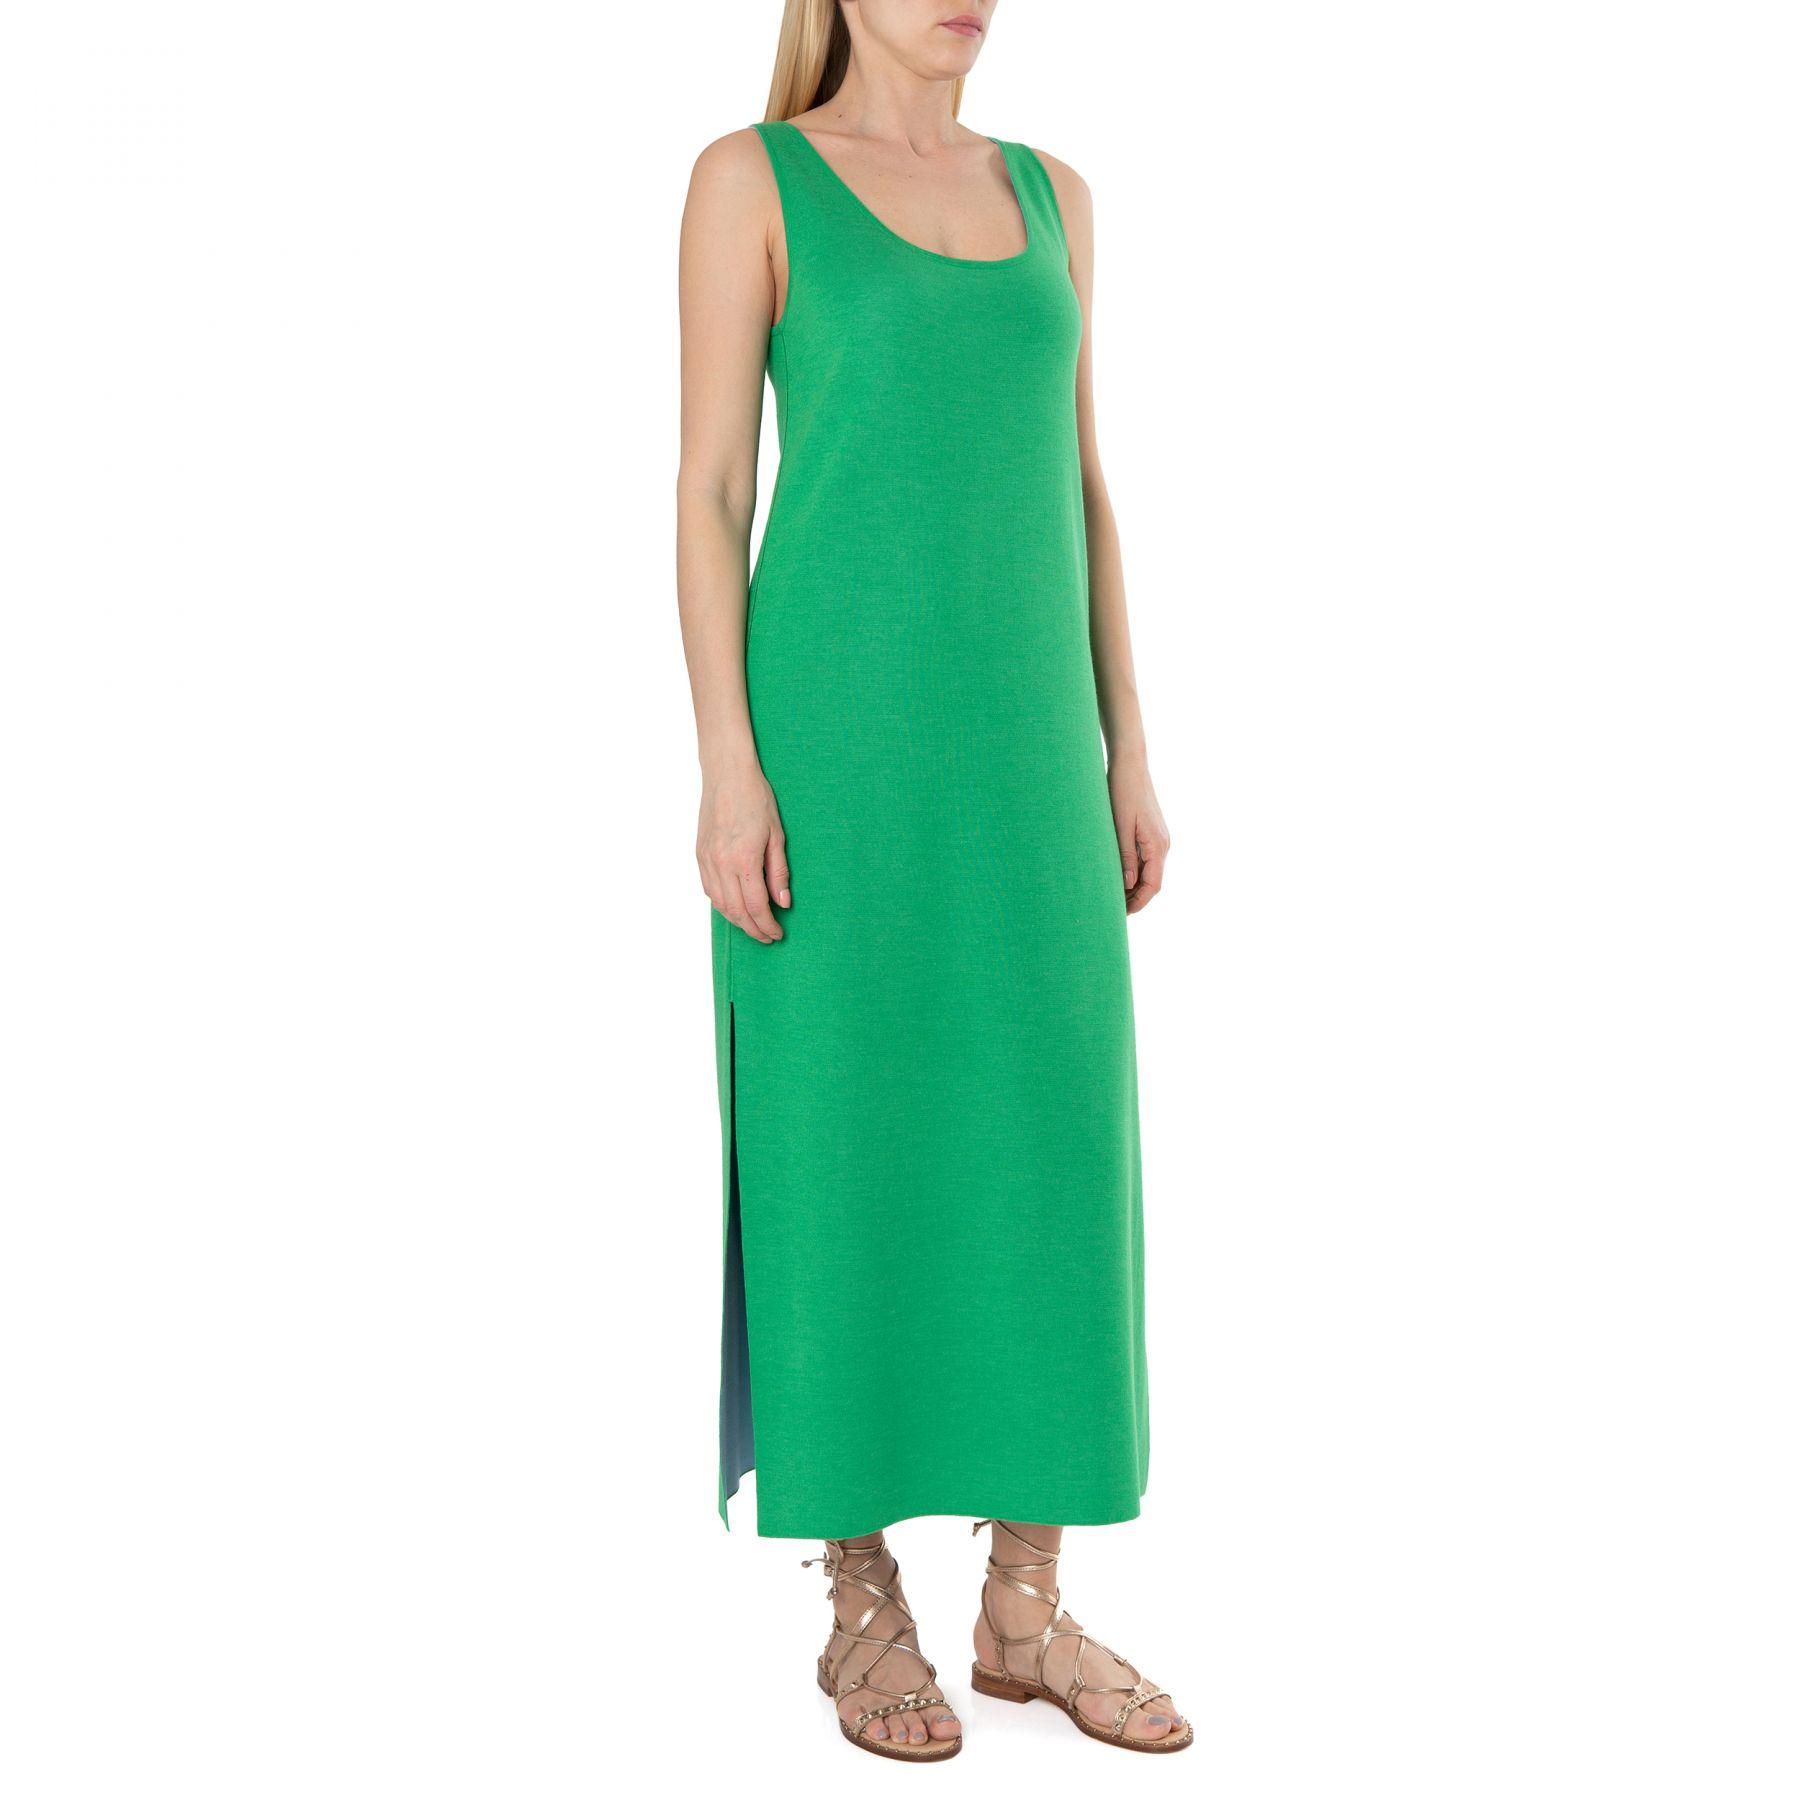 Платье MUS (Maison Myriam Ullens) зеленое